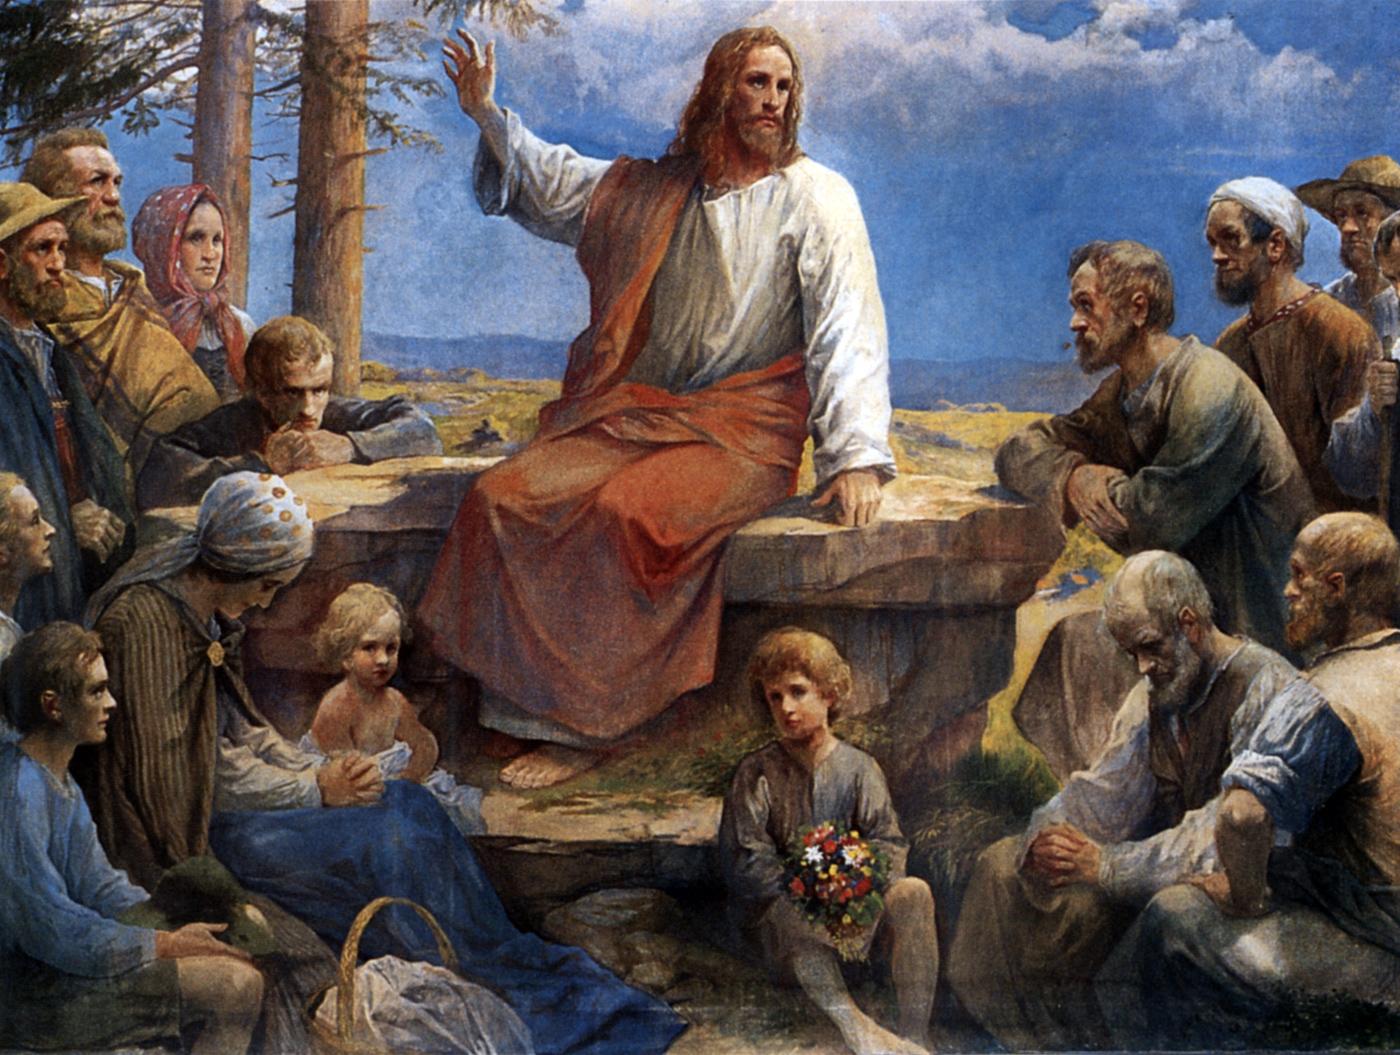 https://i1.wp.com/www.newemangelization.com/wp-content/uploads/2012/12/Yelin-bergpredigt-ca1912.jpeg